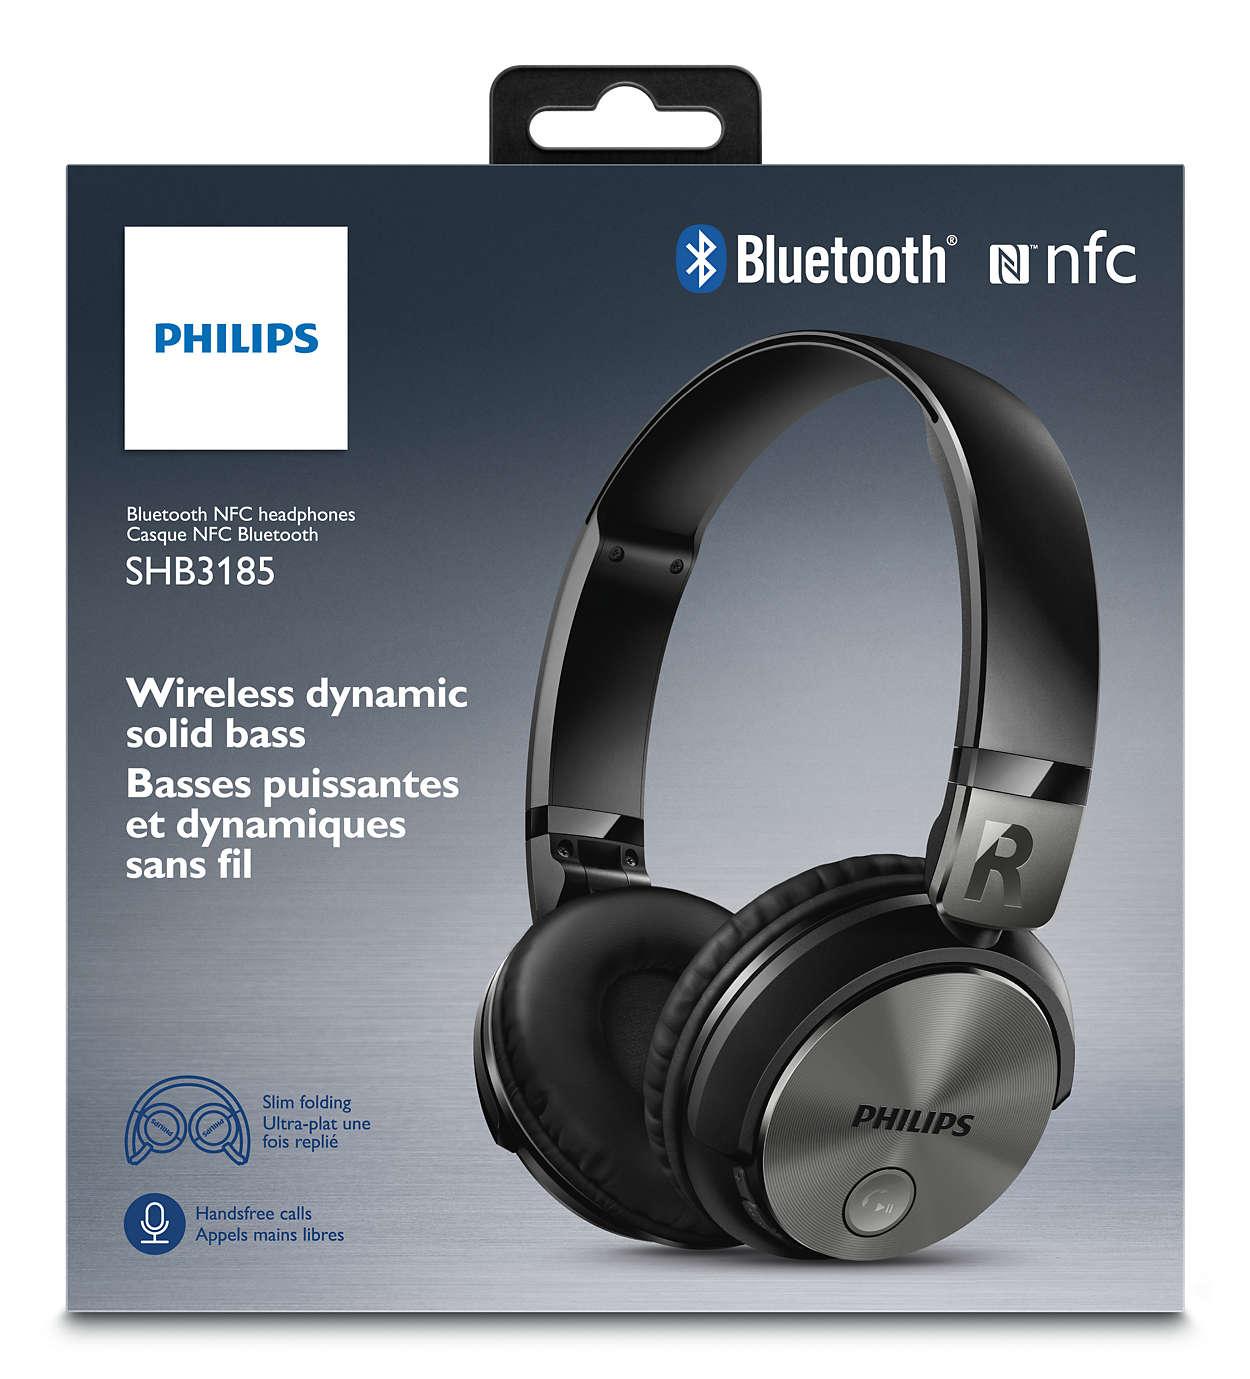 New philips shb3165 wireless cuffie bluetooth nero 1 anno - Cuffie traduzione ...